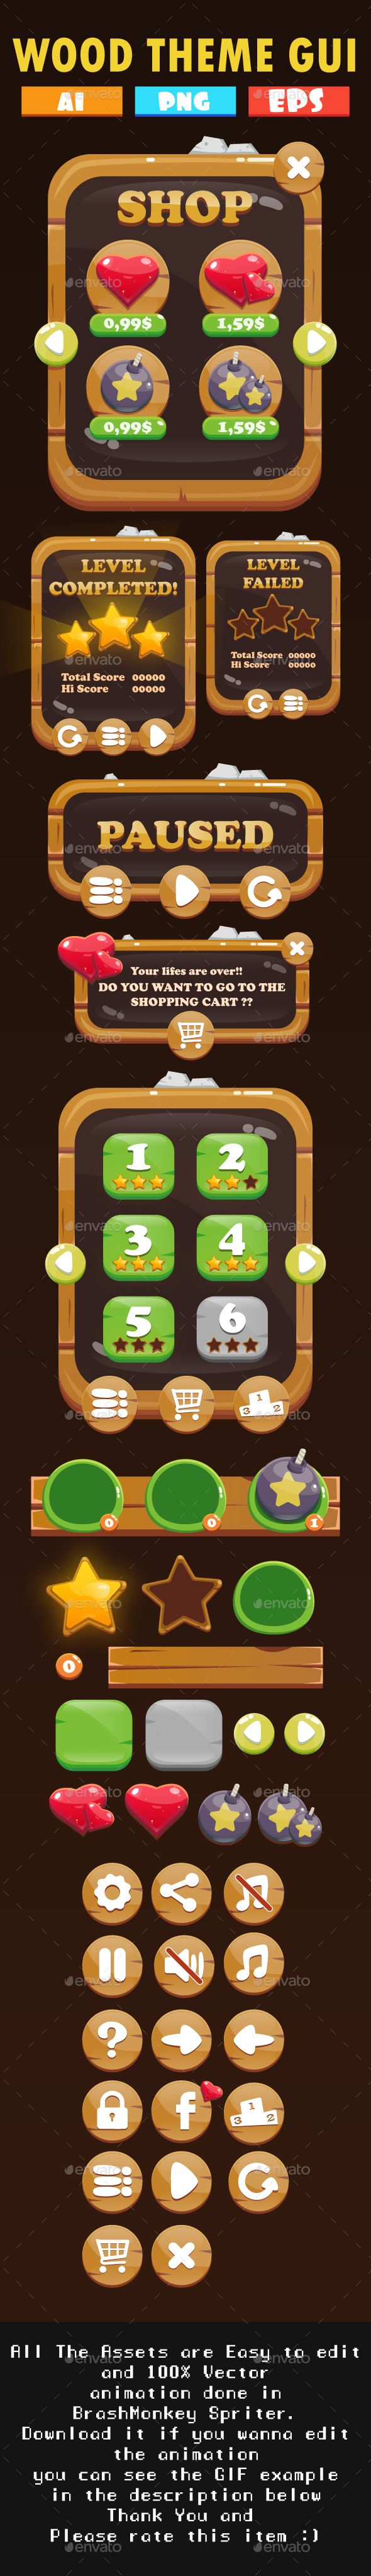 Wood Platformer GUI Pack - Transparent PNG, Layered PNG, Vector EPS, AI Illustrator #gameui